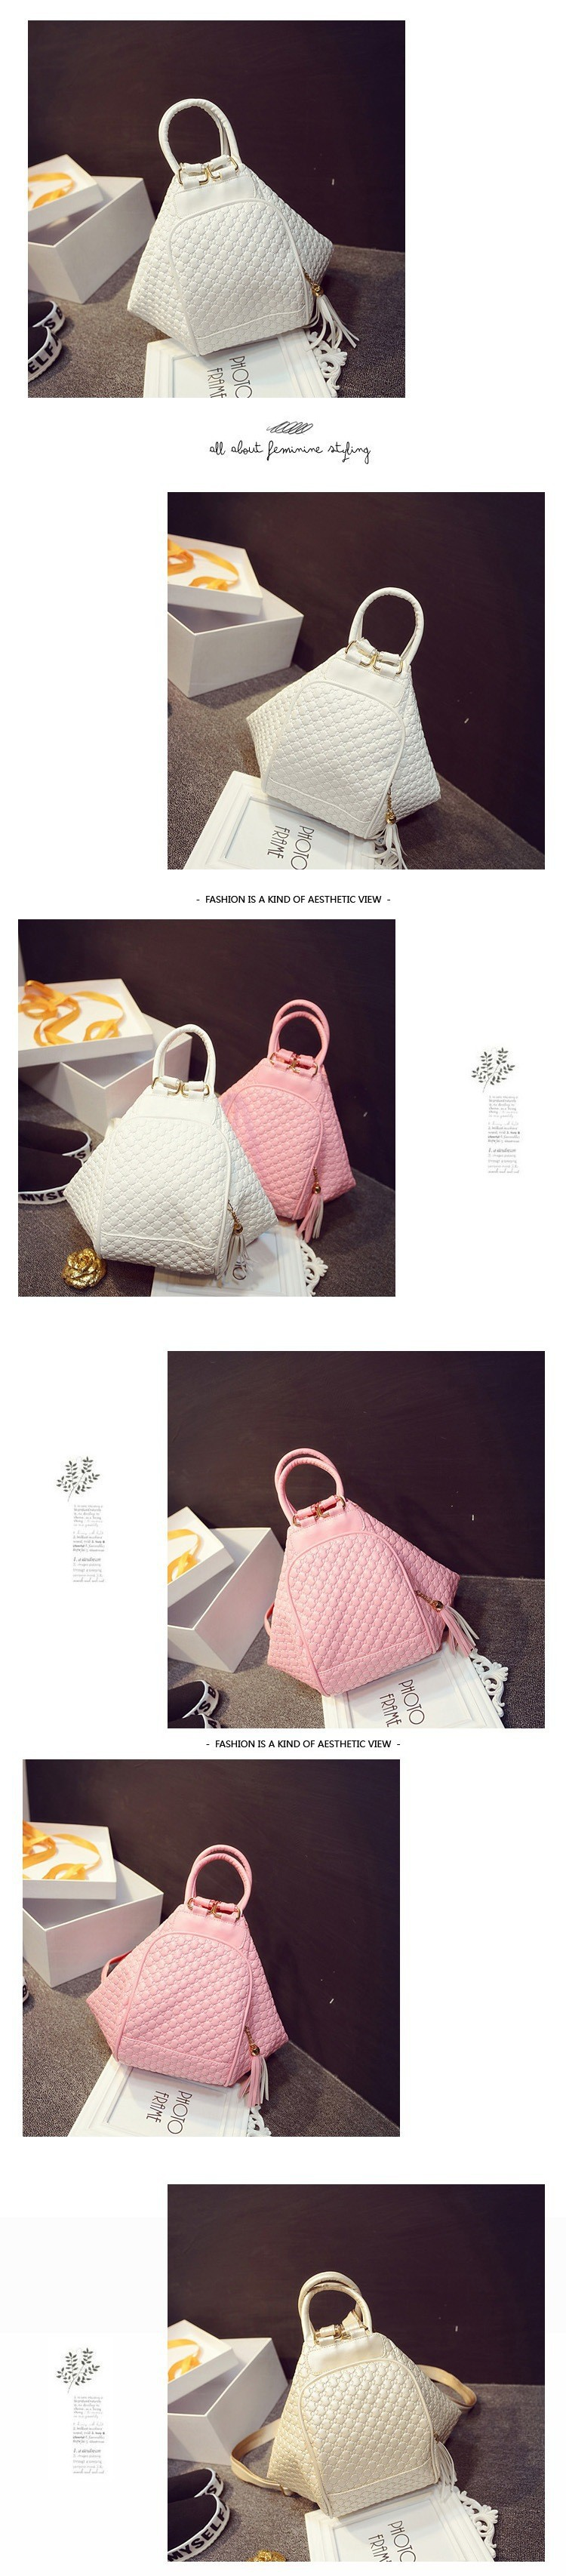 f3ccb660d8 2015 New Fashion Women Backpacks Designer Brand Printing Backpack Women s  PU Leather School Baggage Hiking Backpacks Mochila